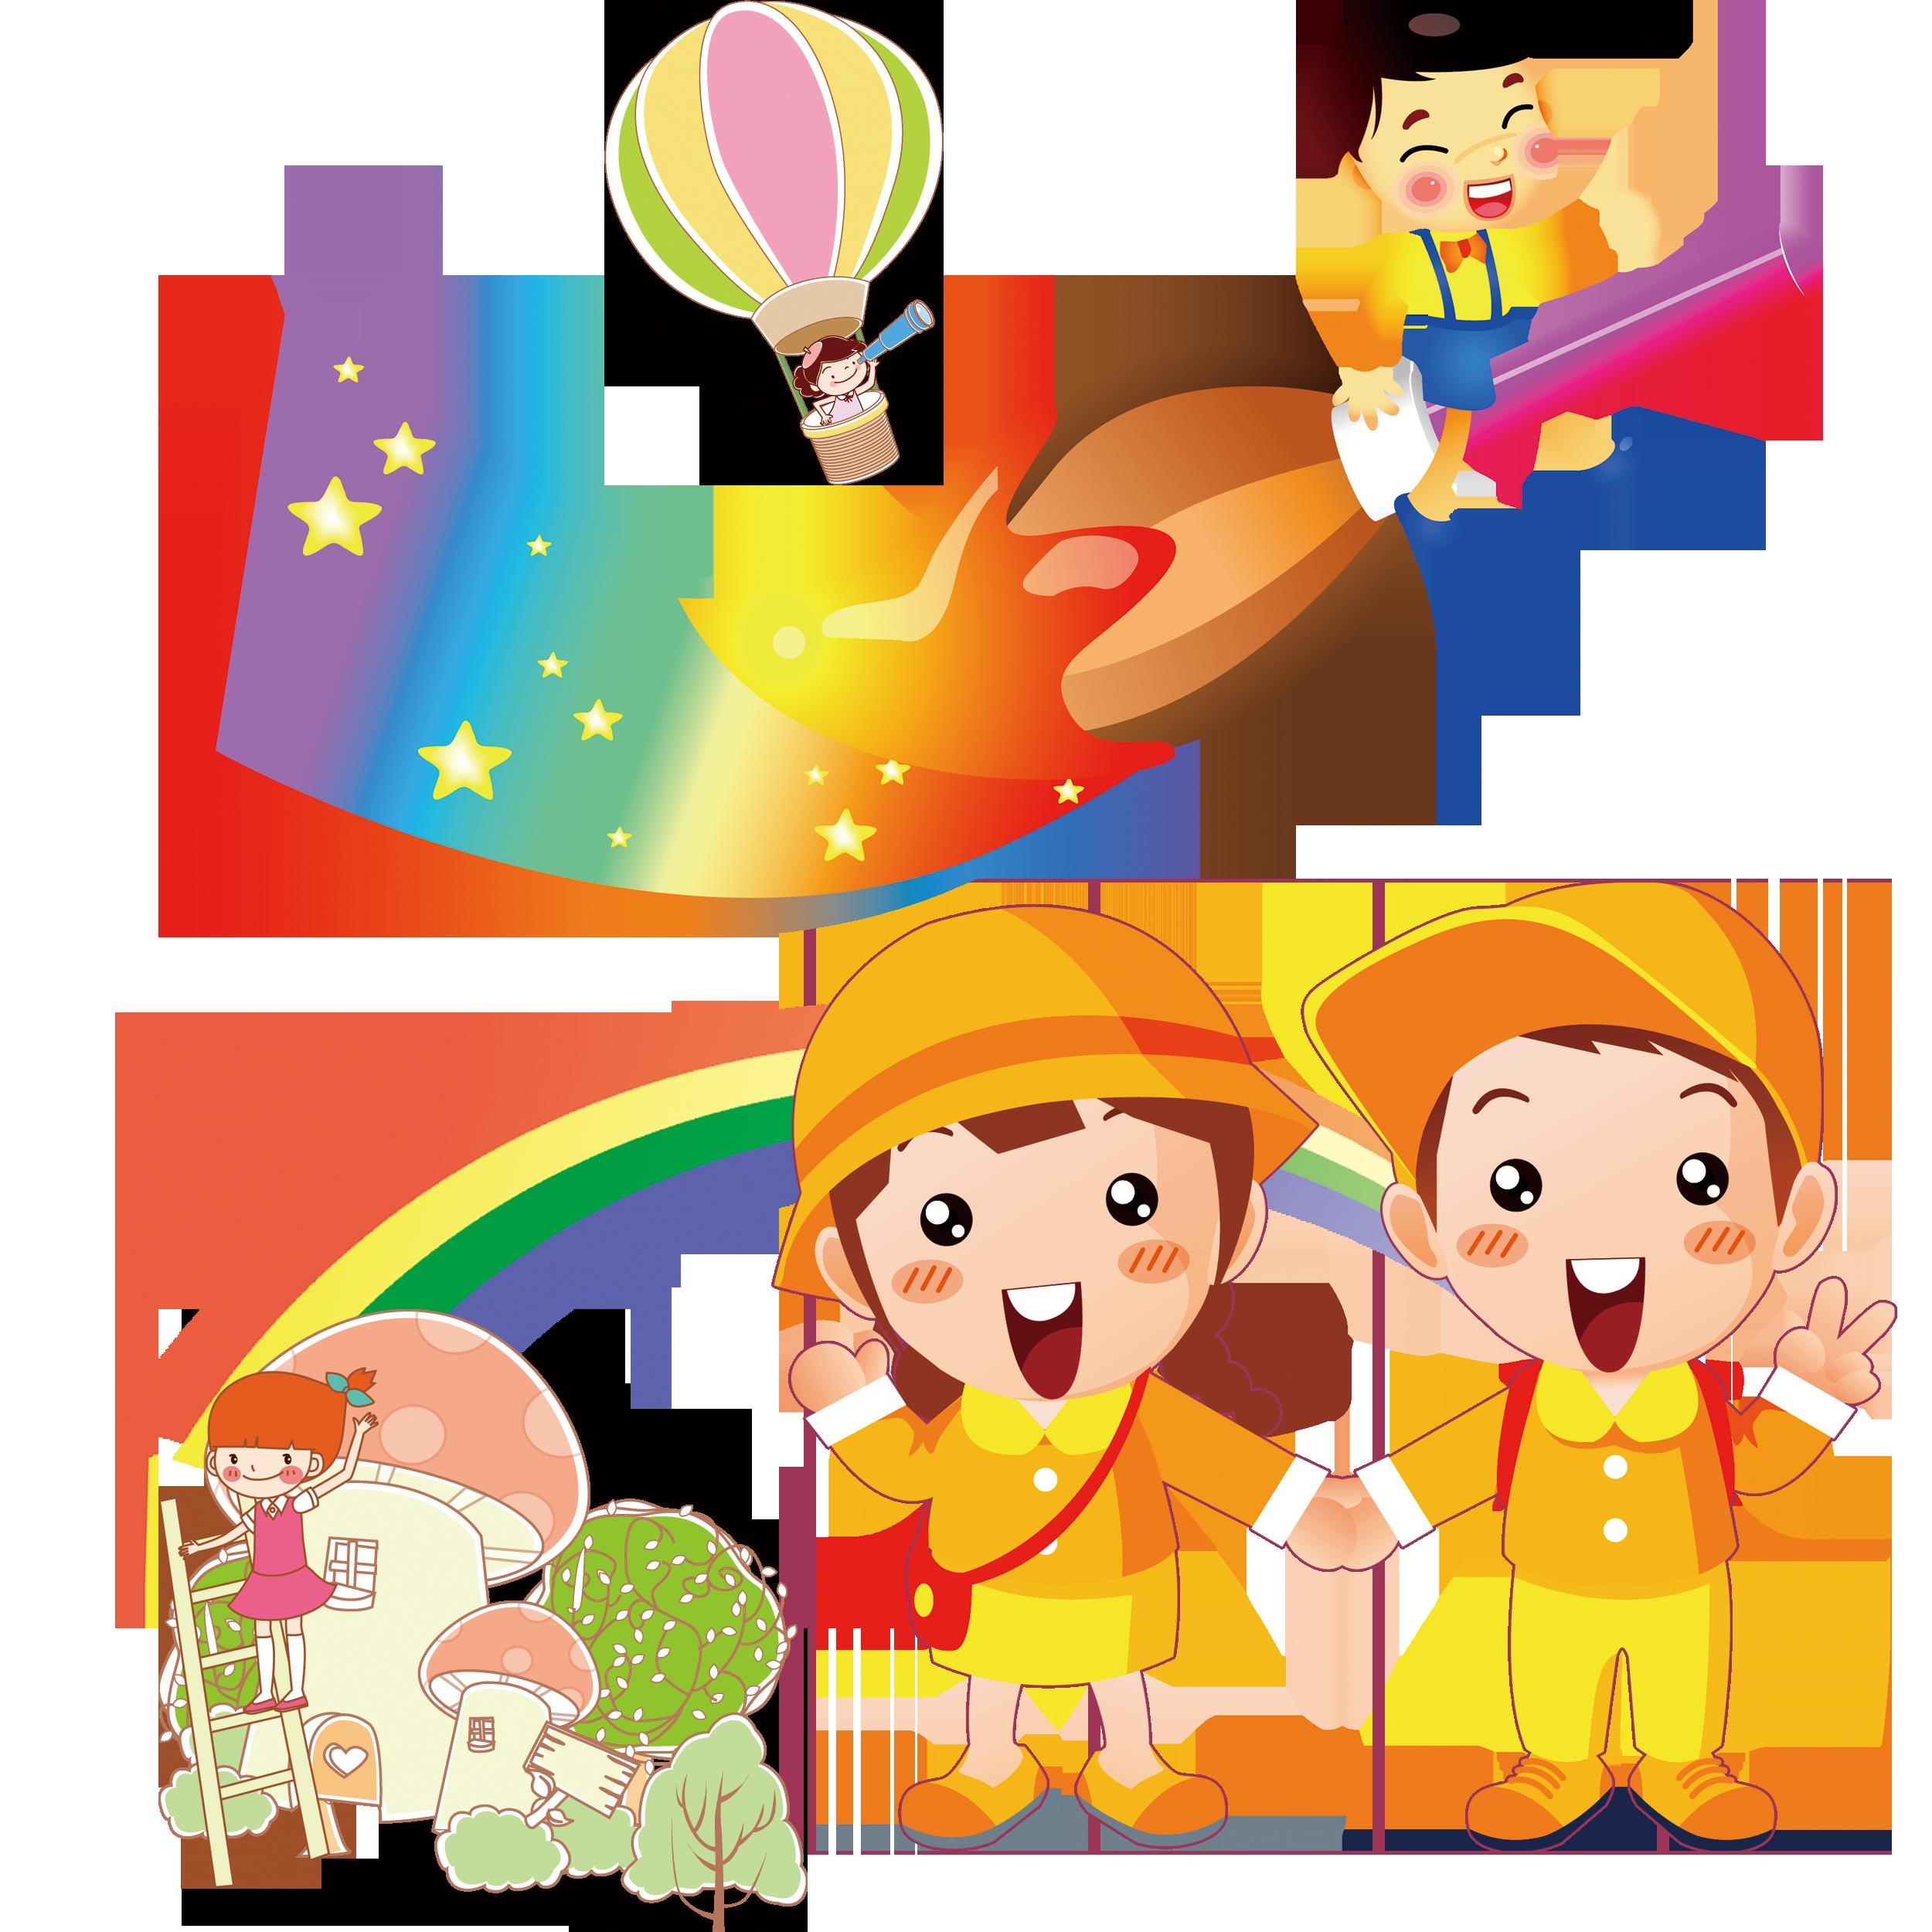 Kindergarten clipart early childhood. Education cartoon school children